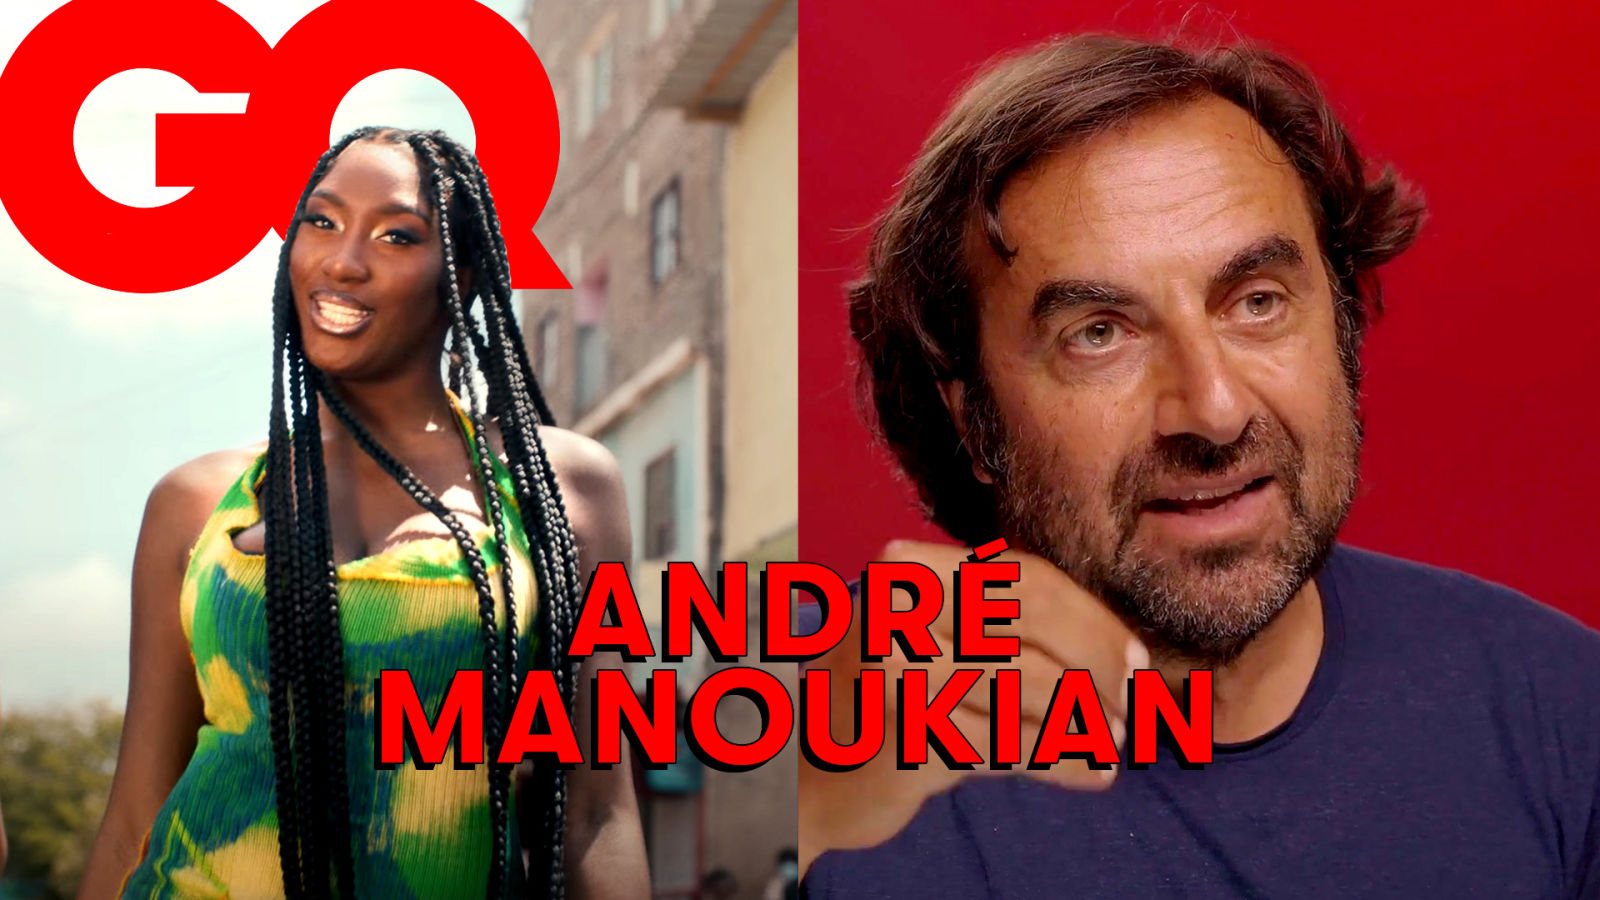 André Manoukian juge le Top Tendances : Soprano, Aya Nakamura, Billie Eilish